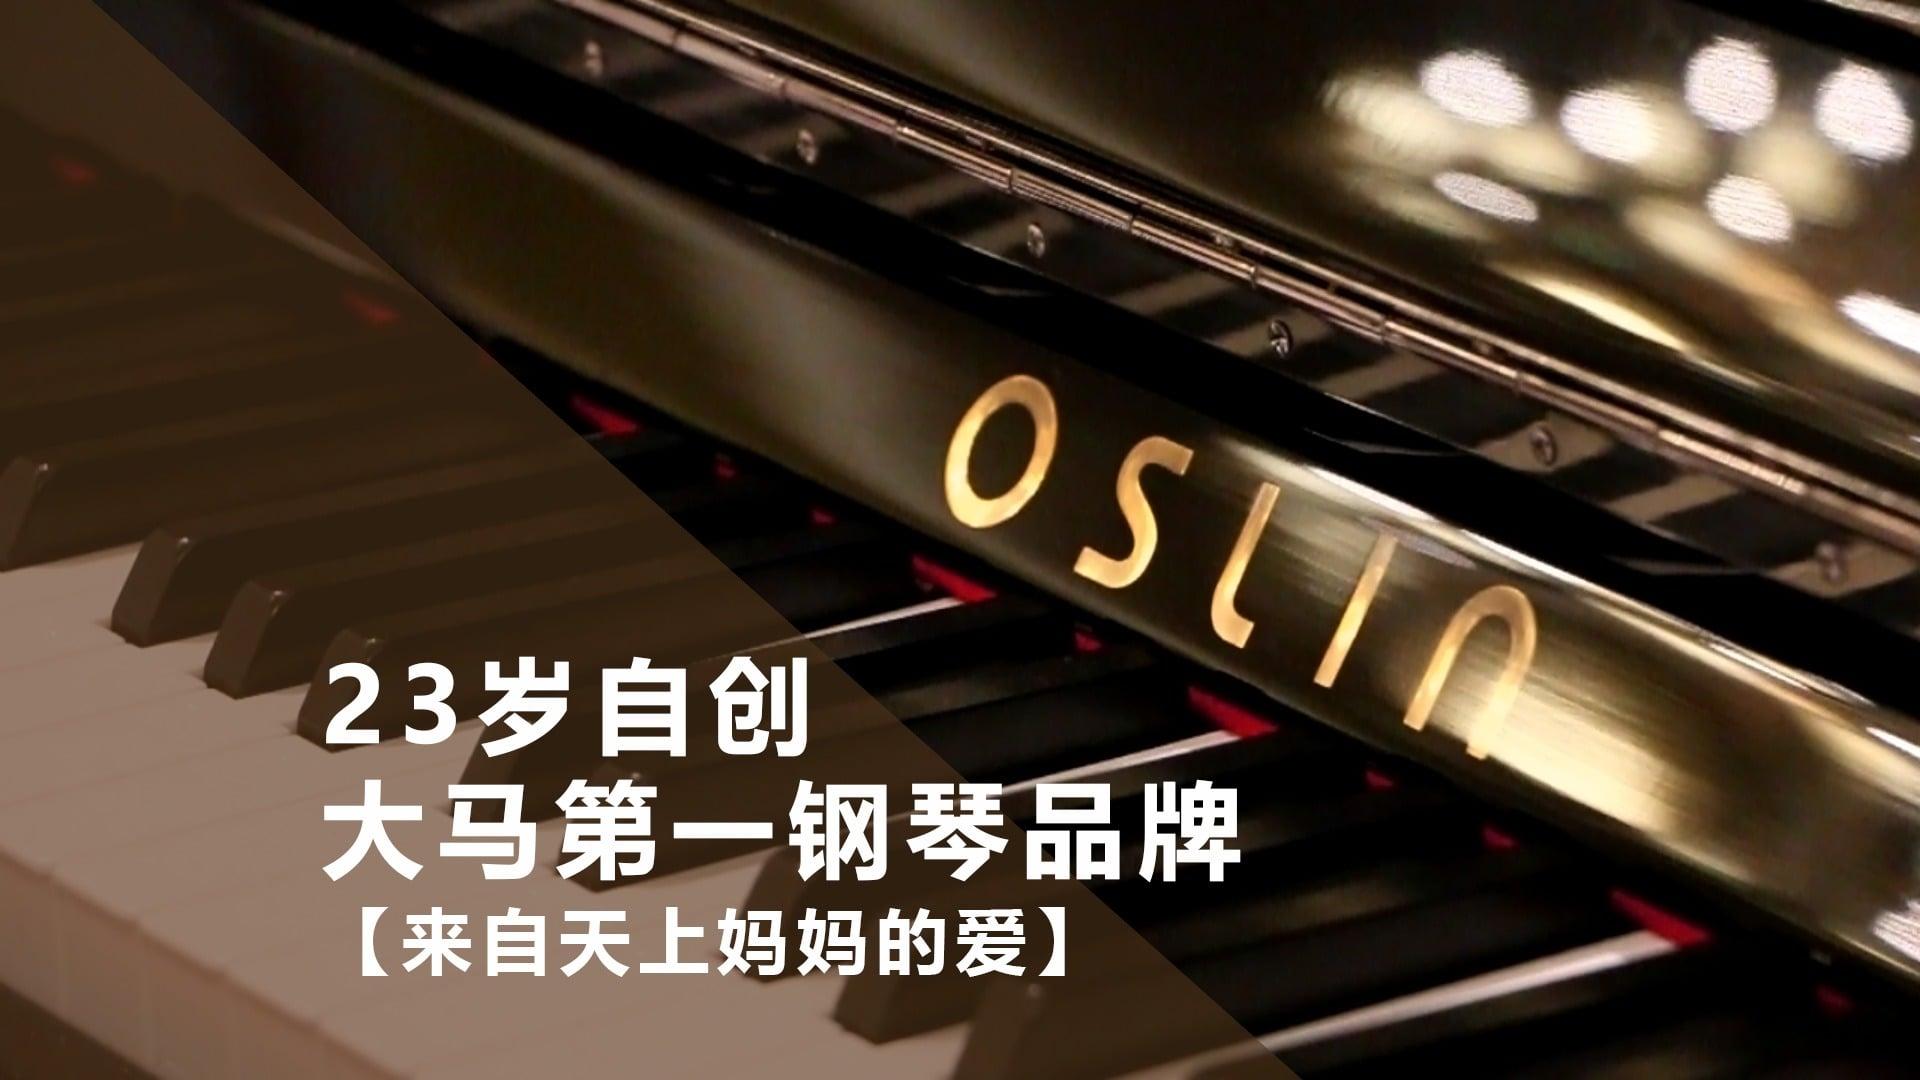 oslin piano title at omgloh.com